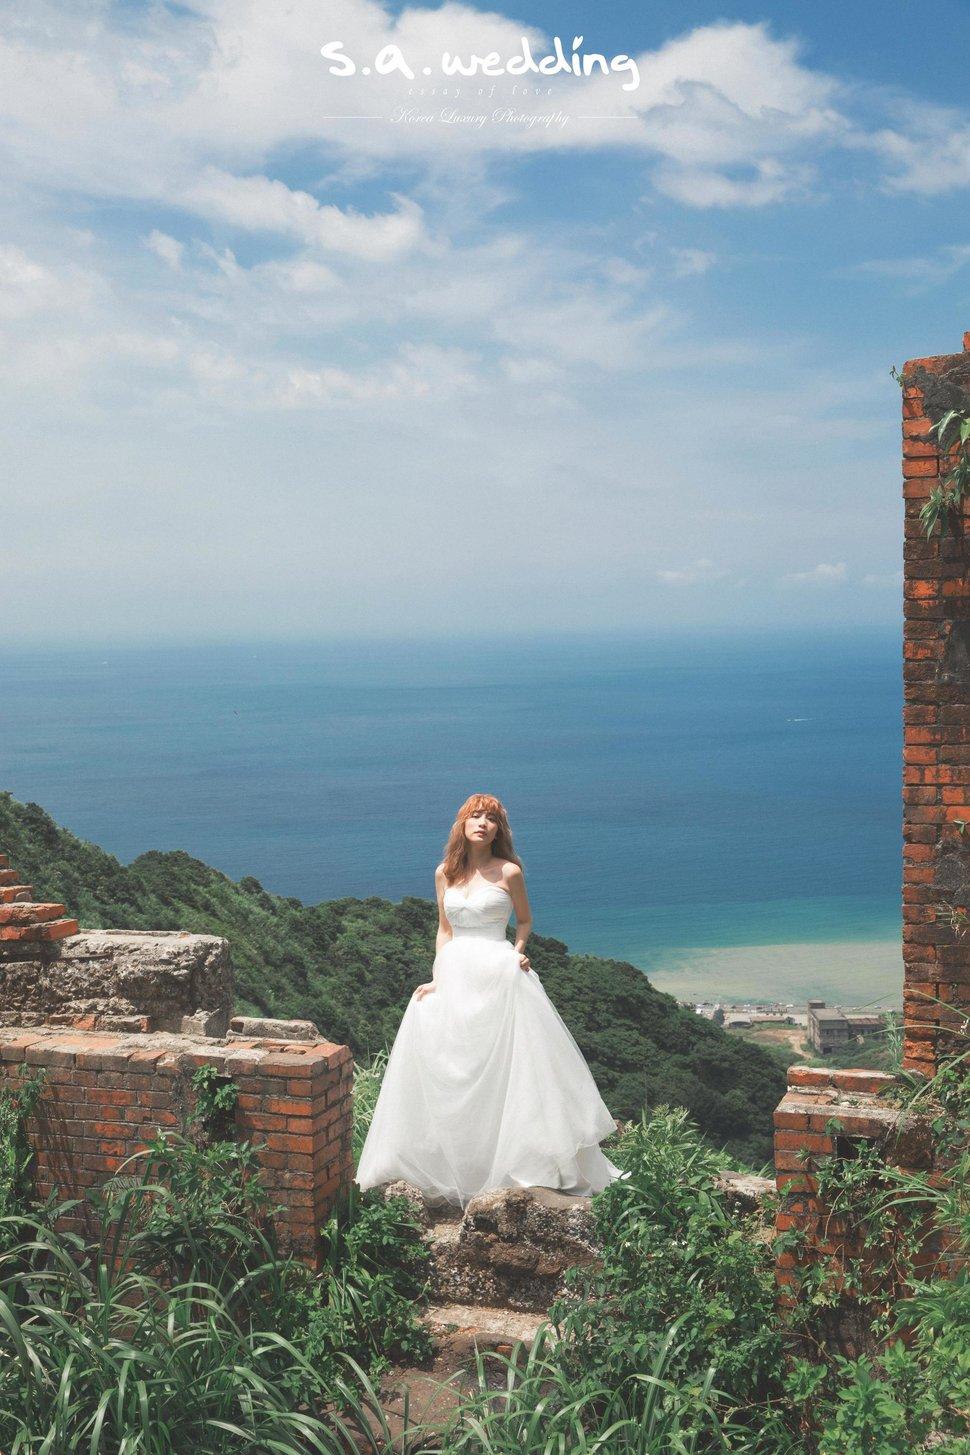 NSH_1162_ps (Copy) - s.a. wedding 韓國婚紗攝影《結婚吧》